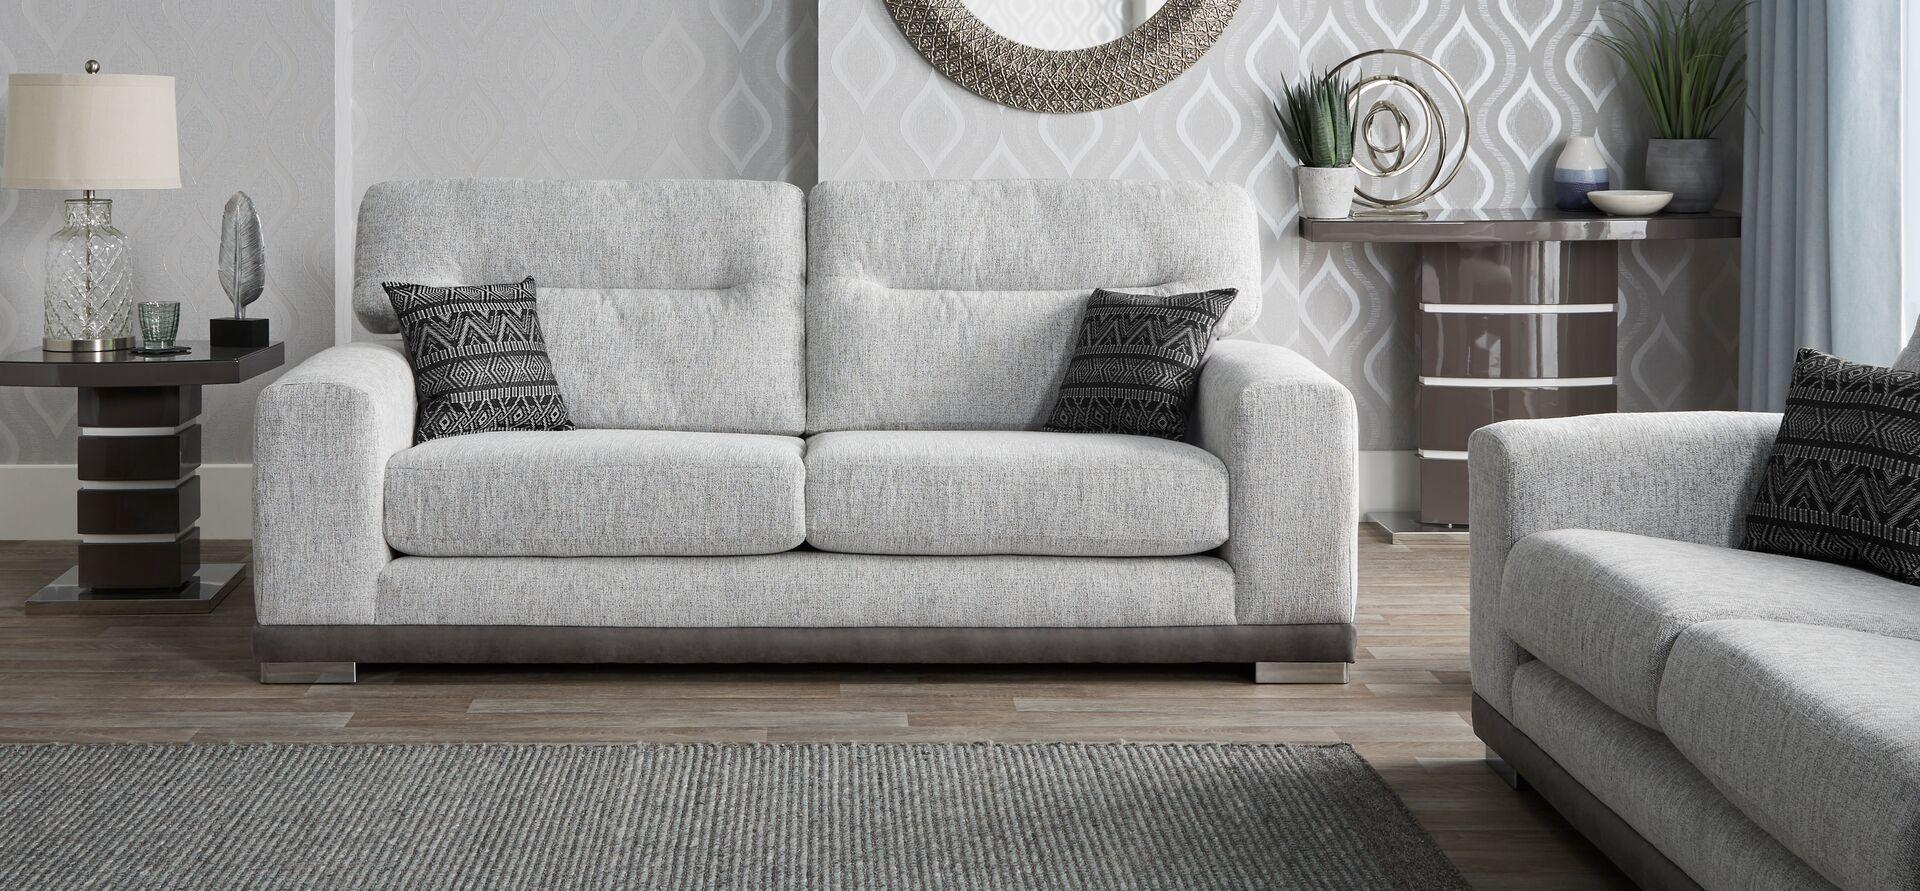 Ariel 3 Seater Sofa Standard Back In 2020 Corner Sofa Fabric 3 Seater Sofa 2 Seater Sofa